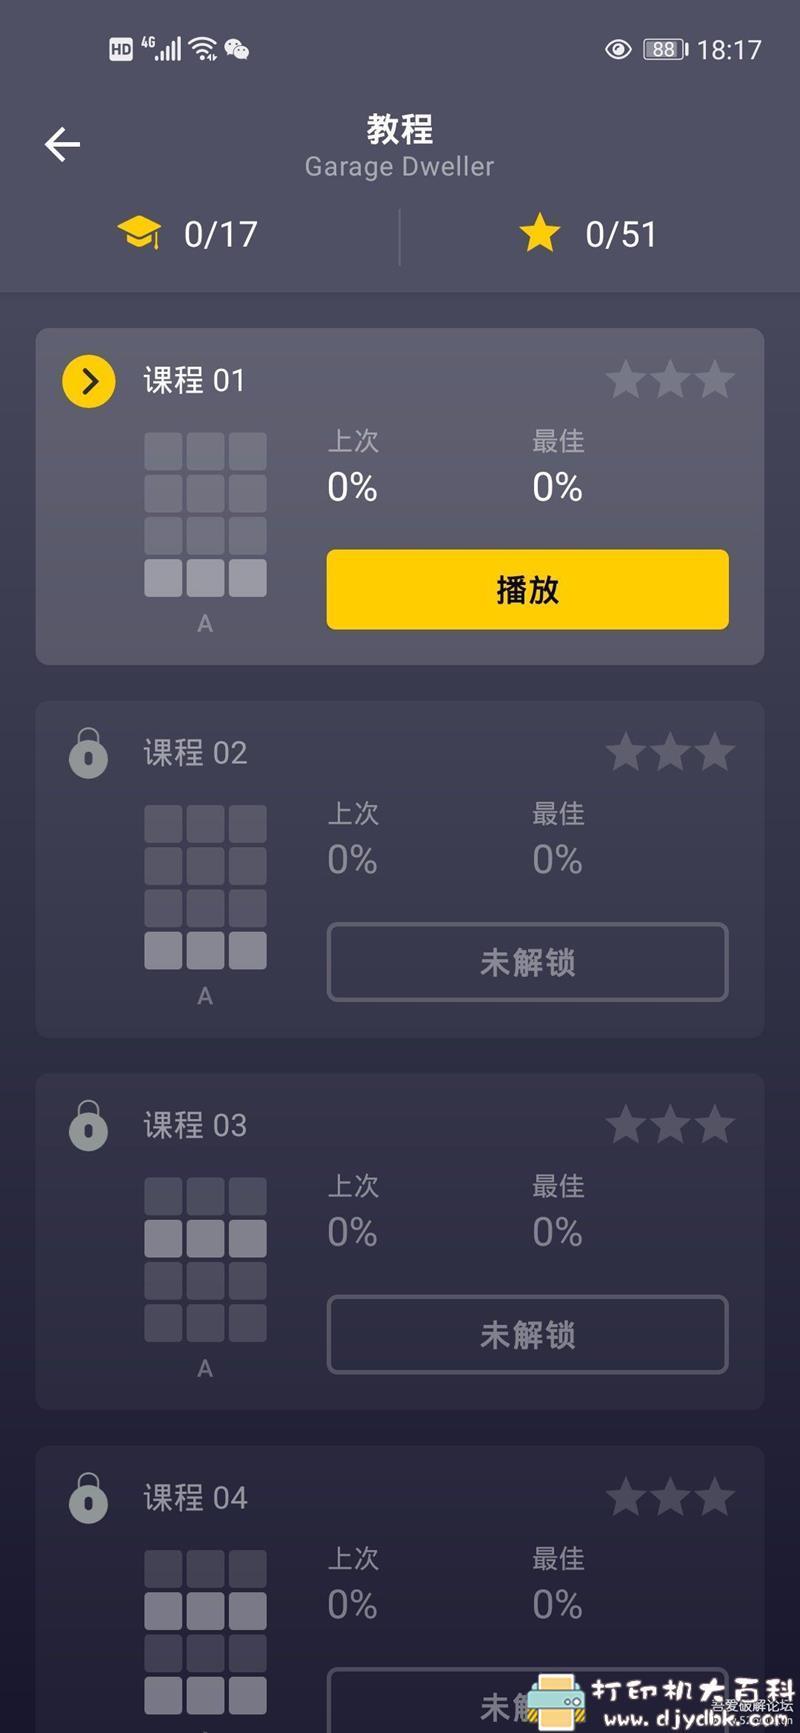 [Android]DPM–一款制作音乐的小软件,也可以当游戏玩 配图 No.3